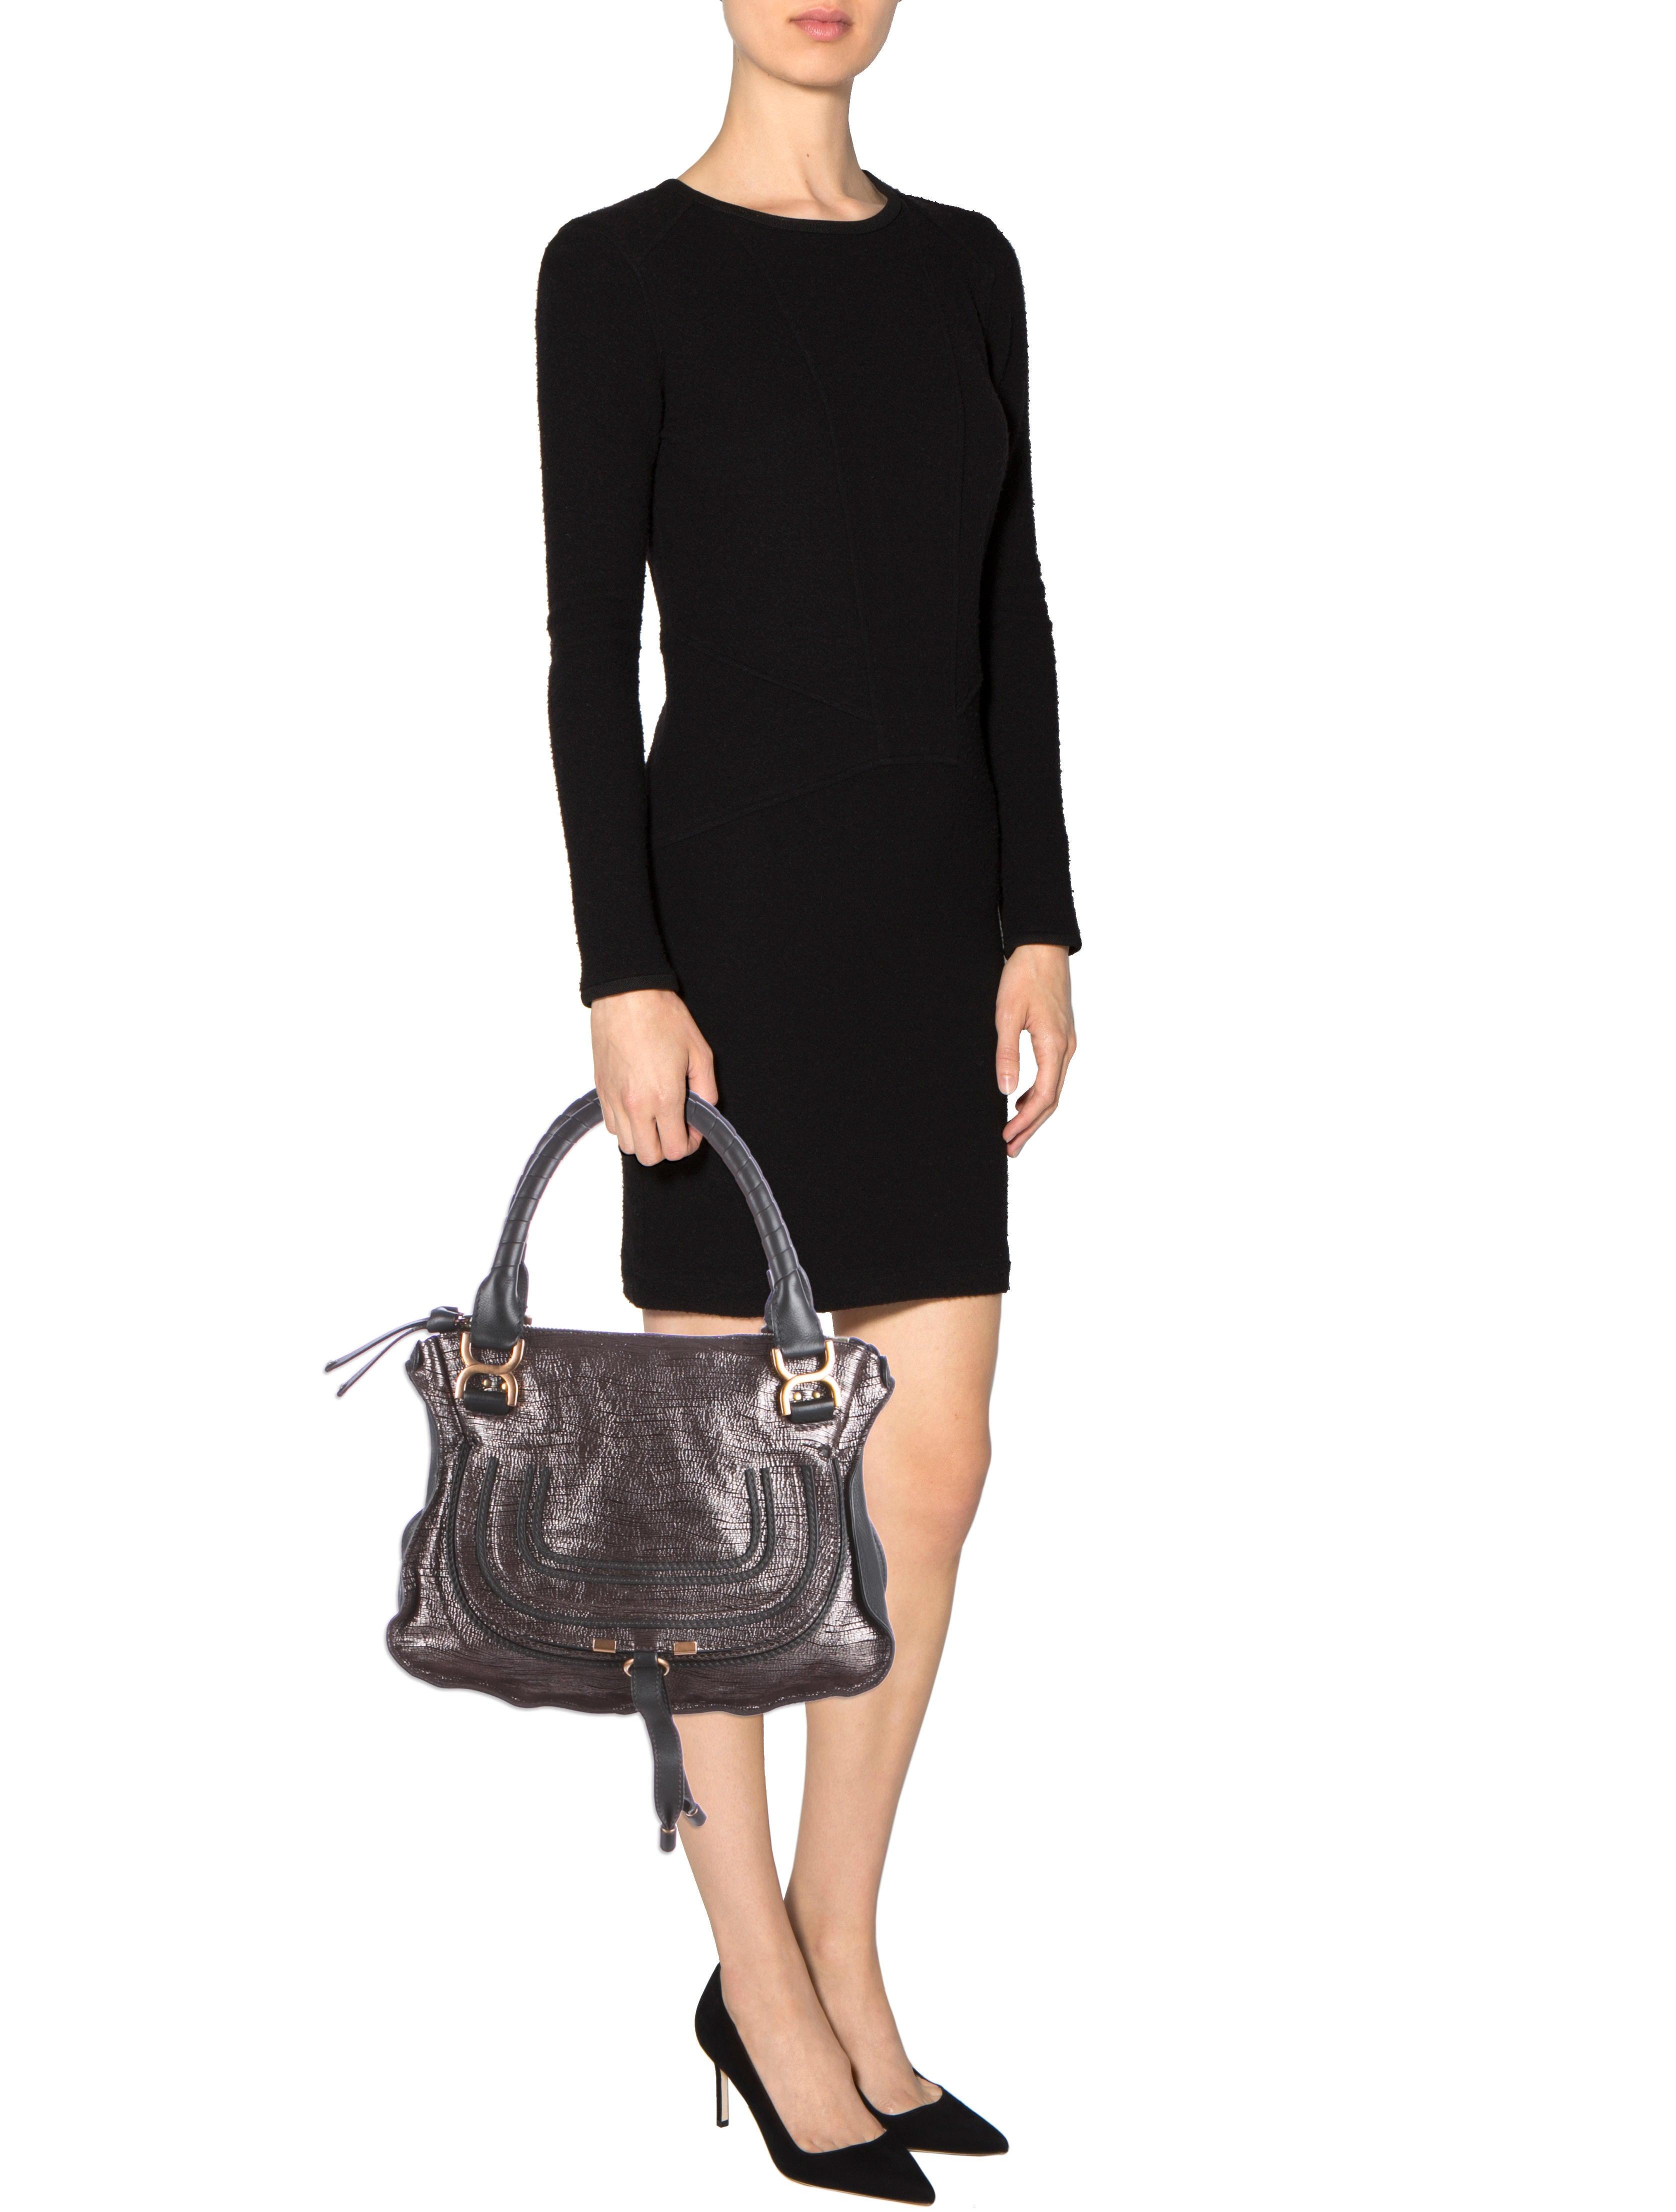 Chlo�� Metallic Marcie Handle Bag - Handbags - CHL36532 | The RealReal